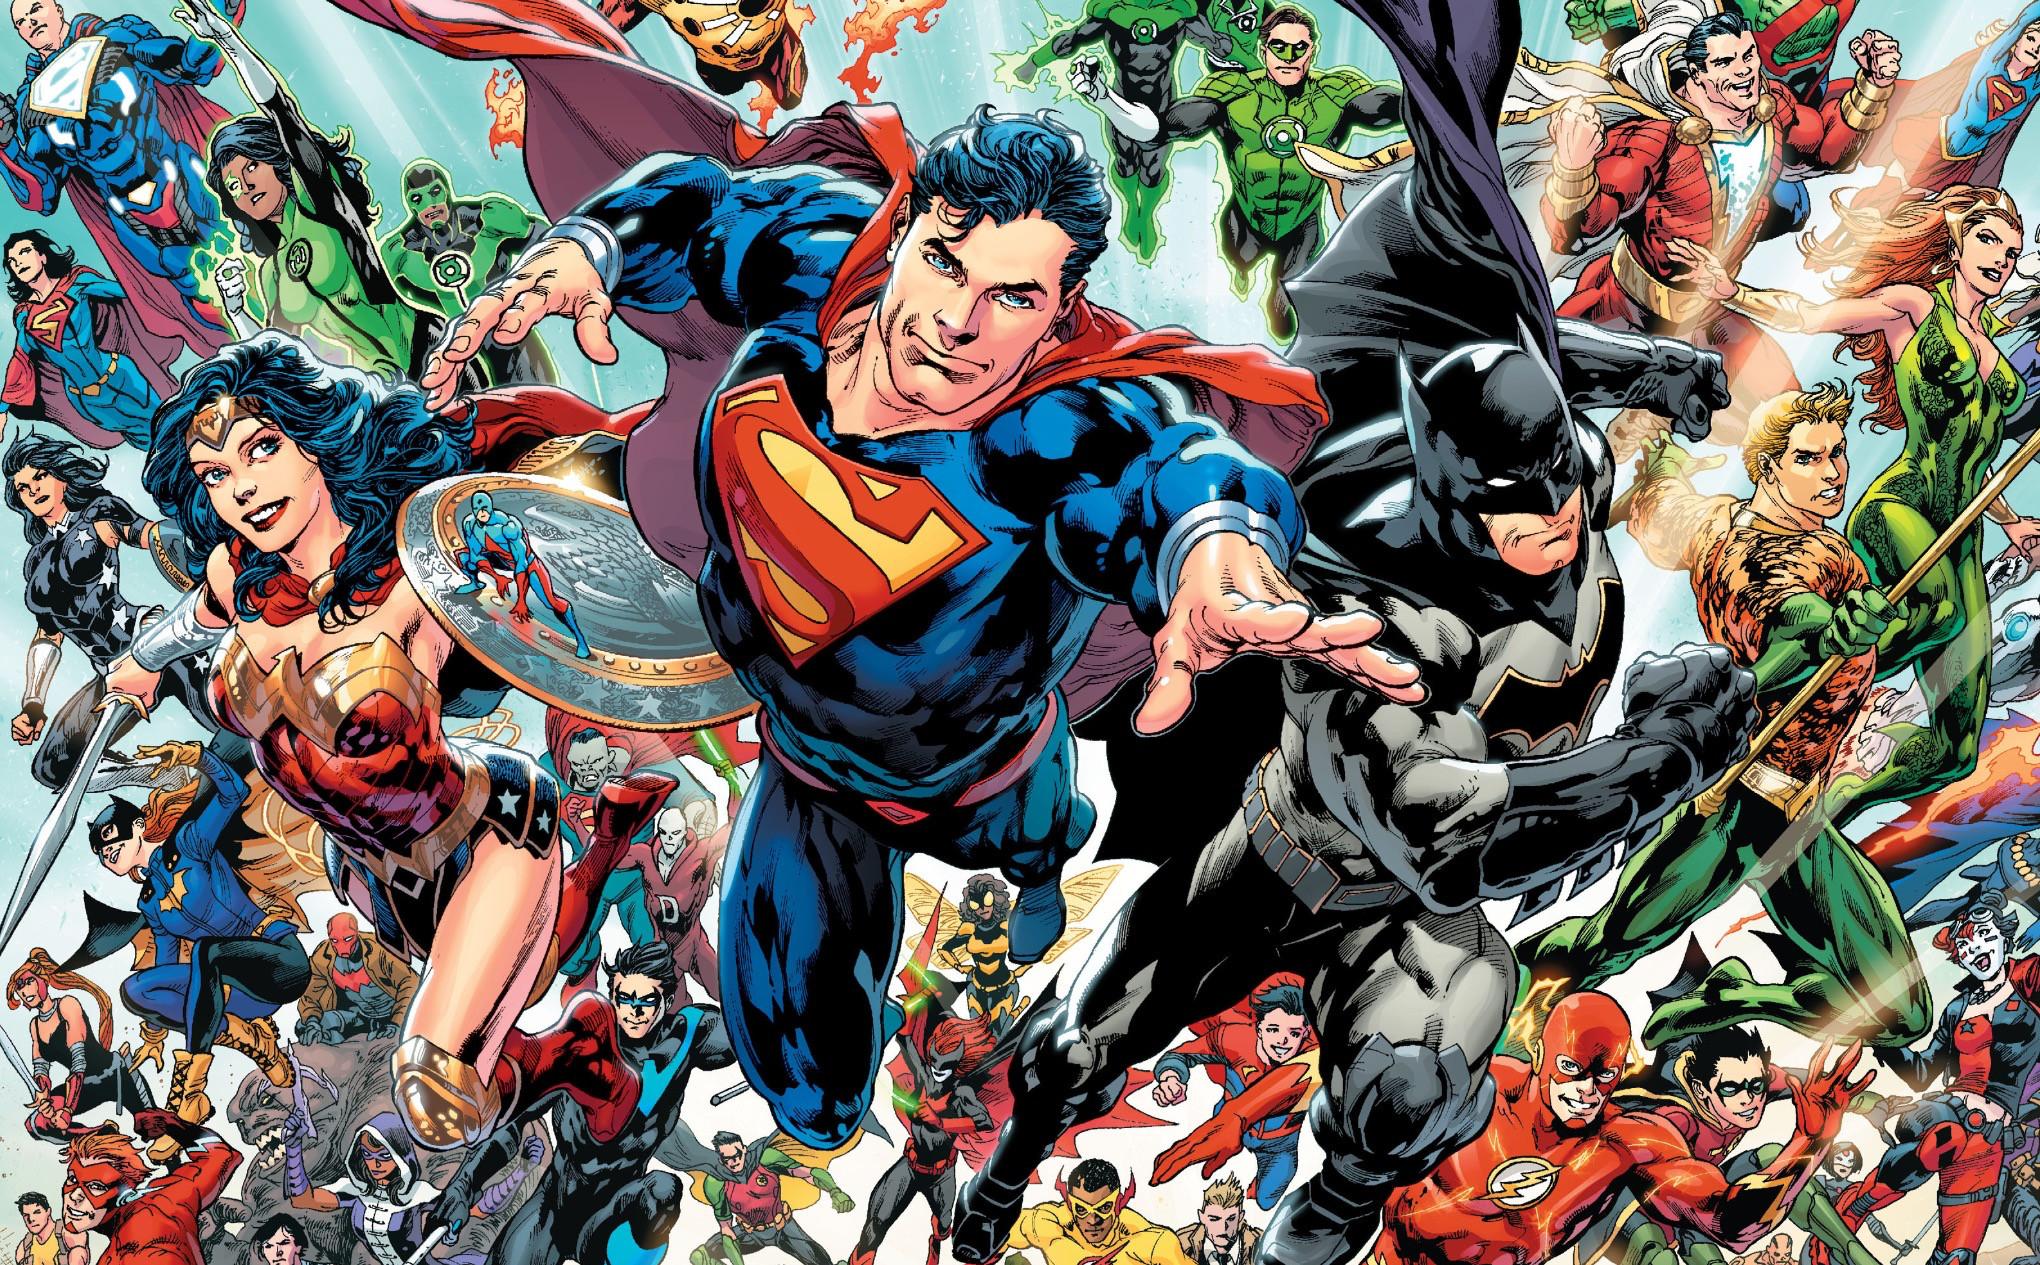 DC Heroes (50 Wallpapers)